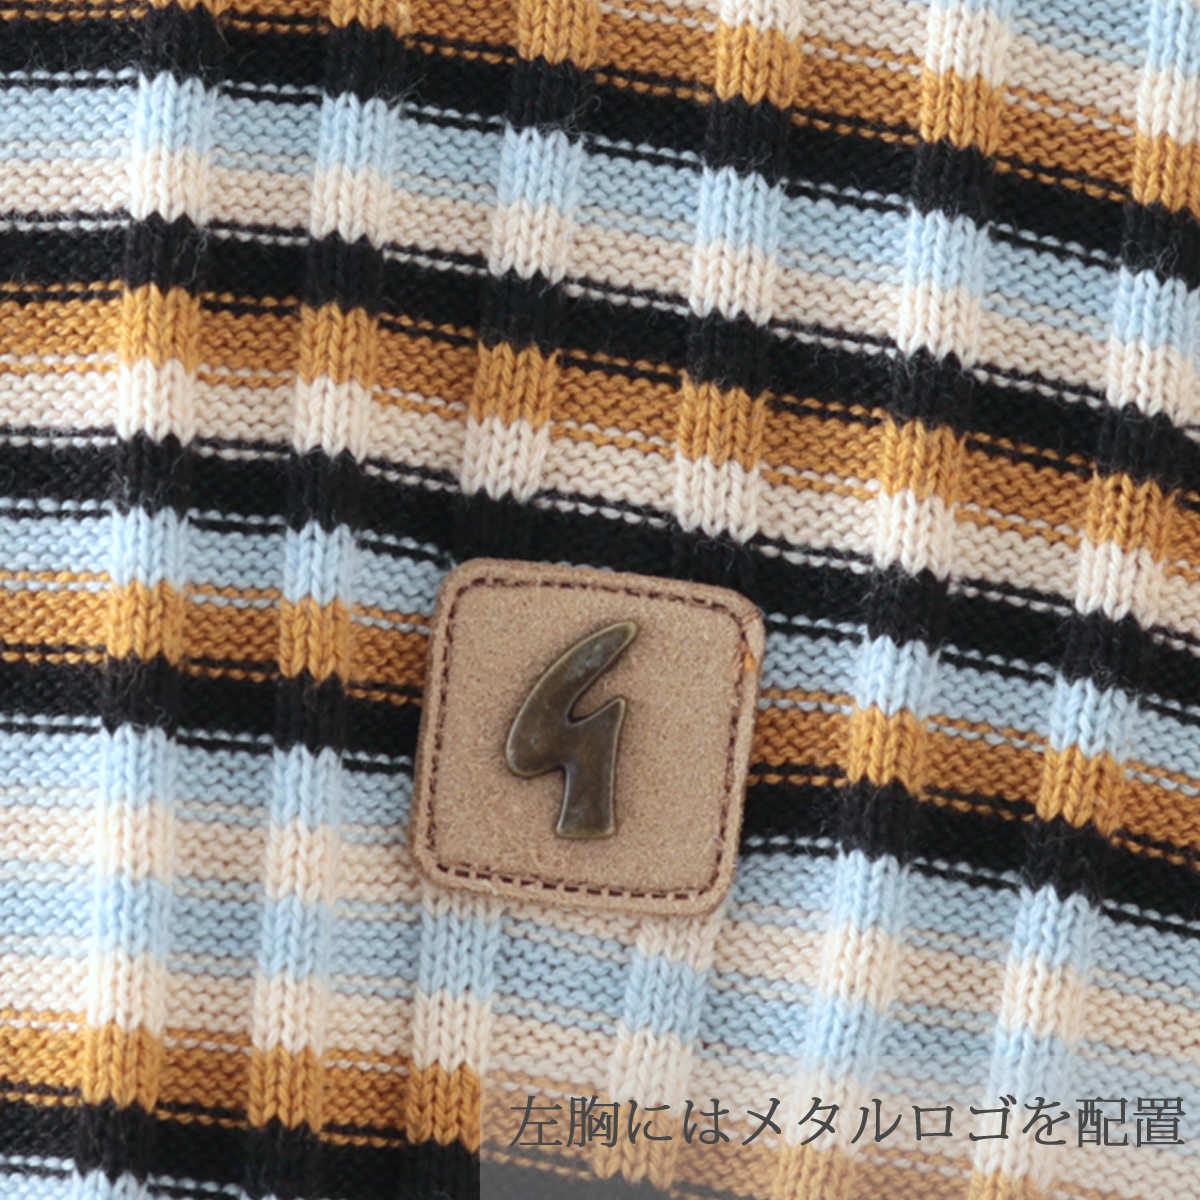 Gabicci メンズ ポロシャツ ポロ ストライプ ニット ガビッチ 2色 ヘイ ネイビー レトロ モッズファッション